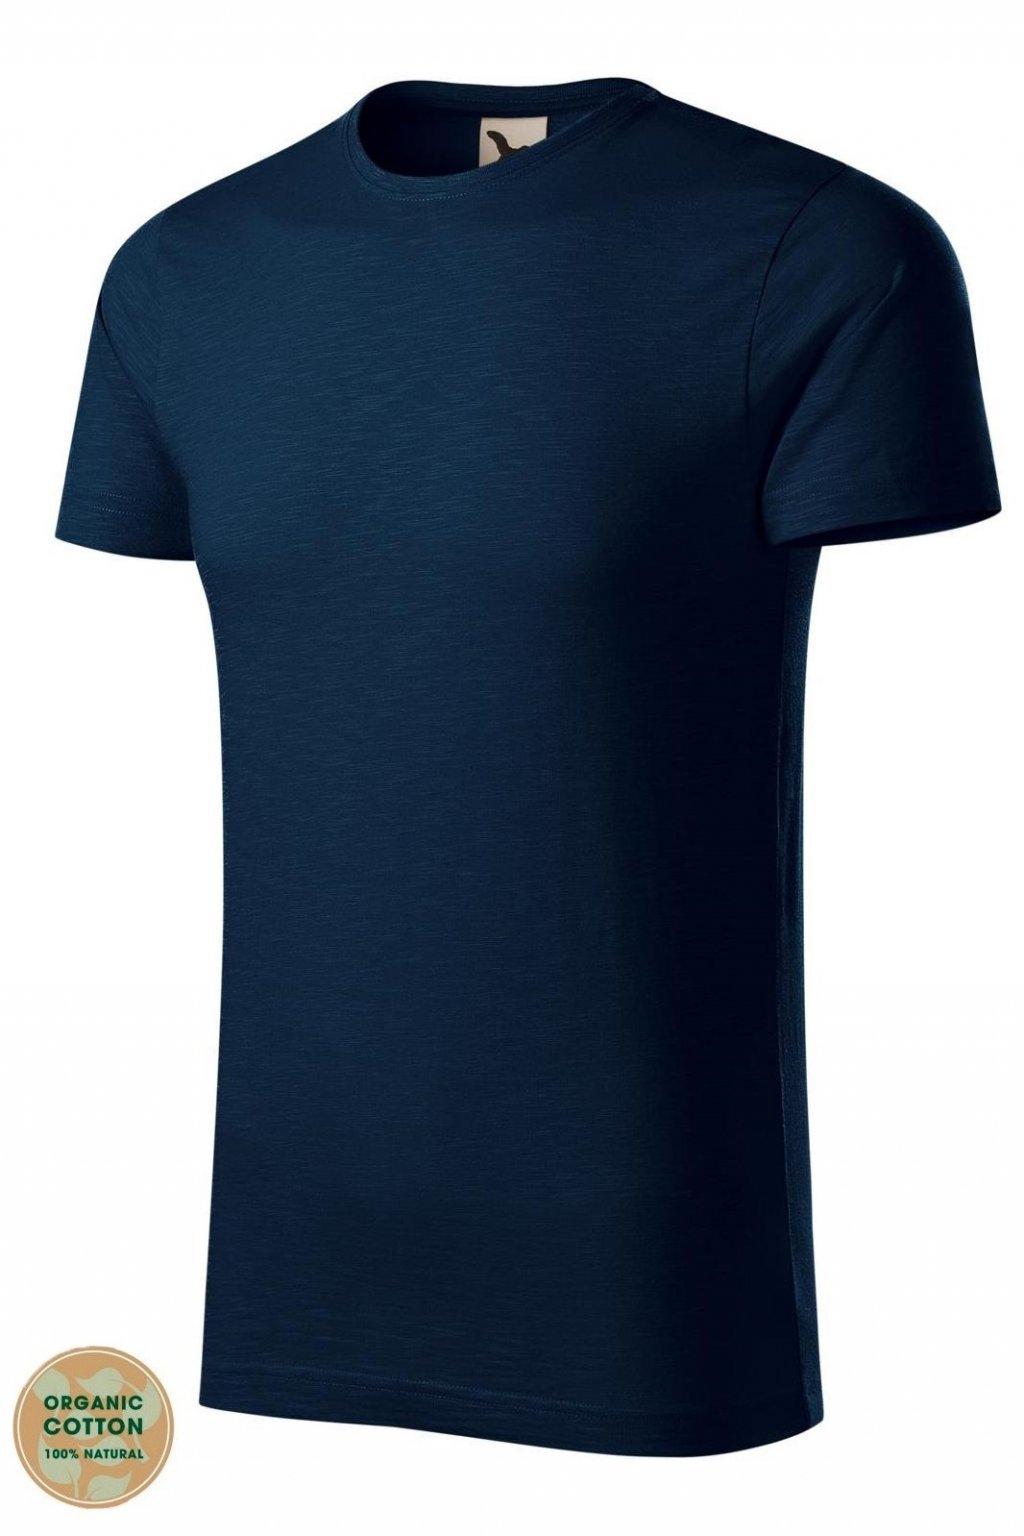 Pánské tričko s krátkým rukávem s organické bavlny MF 173/02